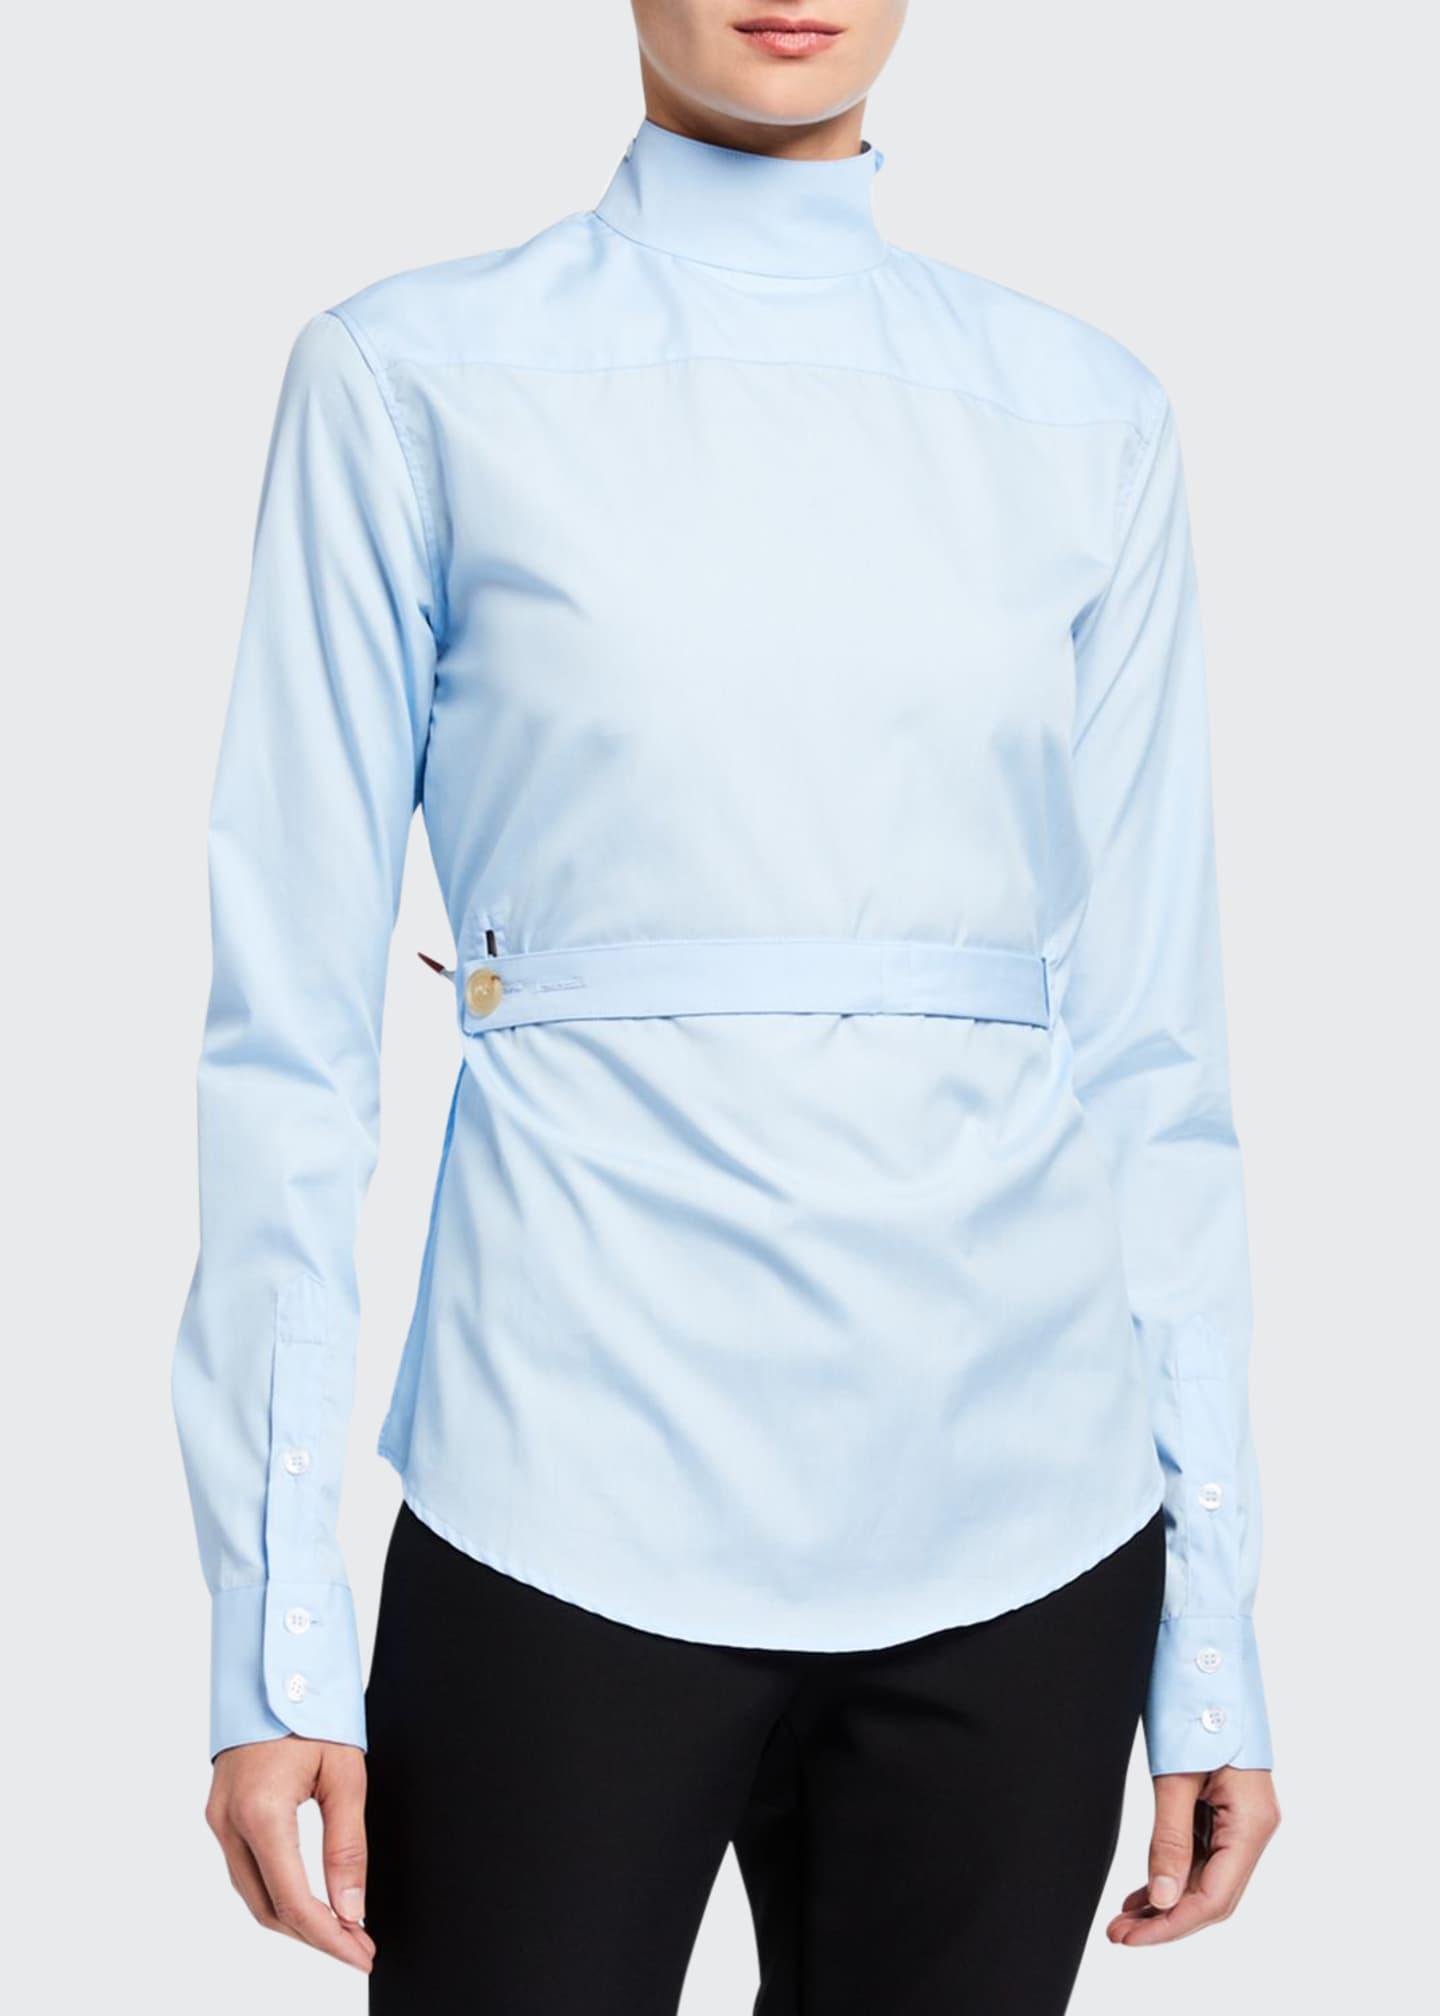 Coperni Cotton Back to Front Shirt